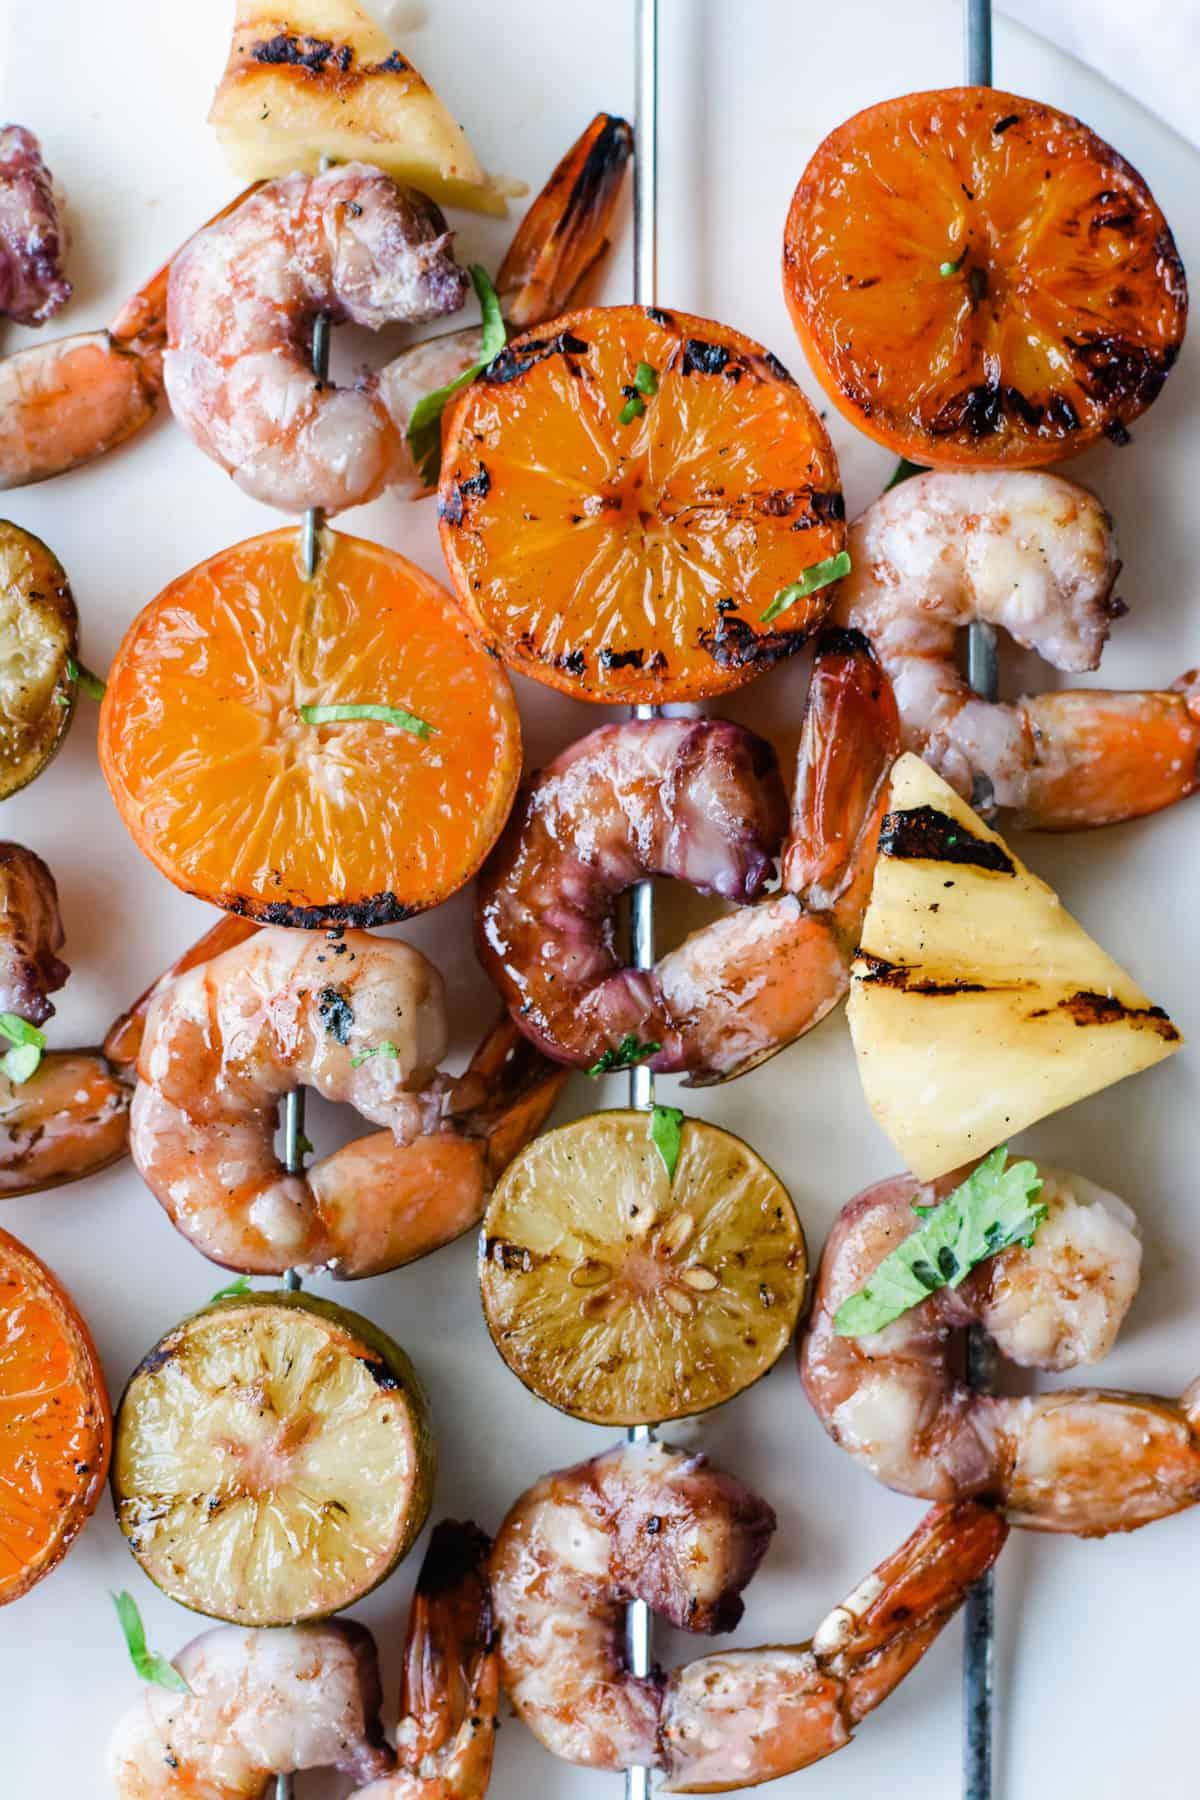 An overhead image of grilled shrimp, grilled tangerine halves, pineapple, and grilled key limes skewered on metal skewers.